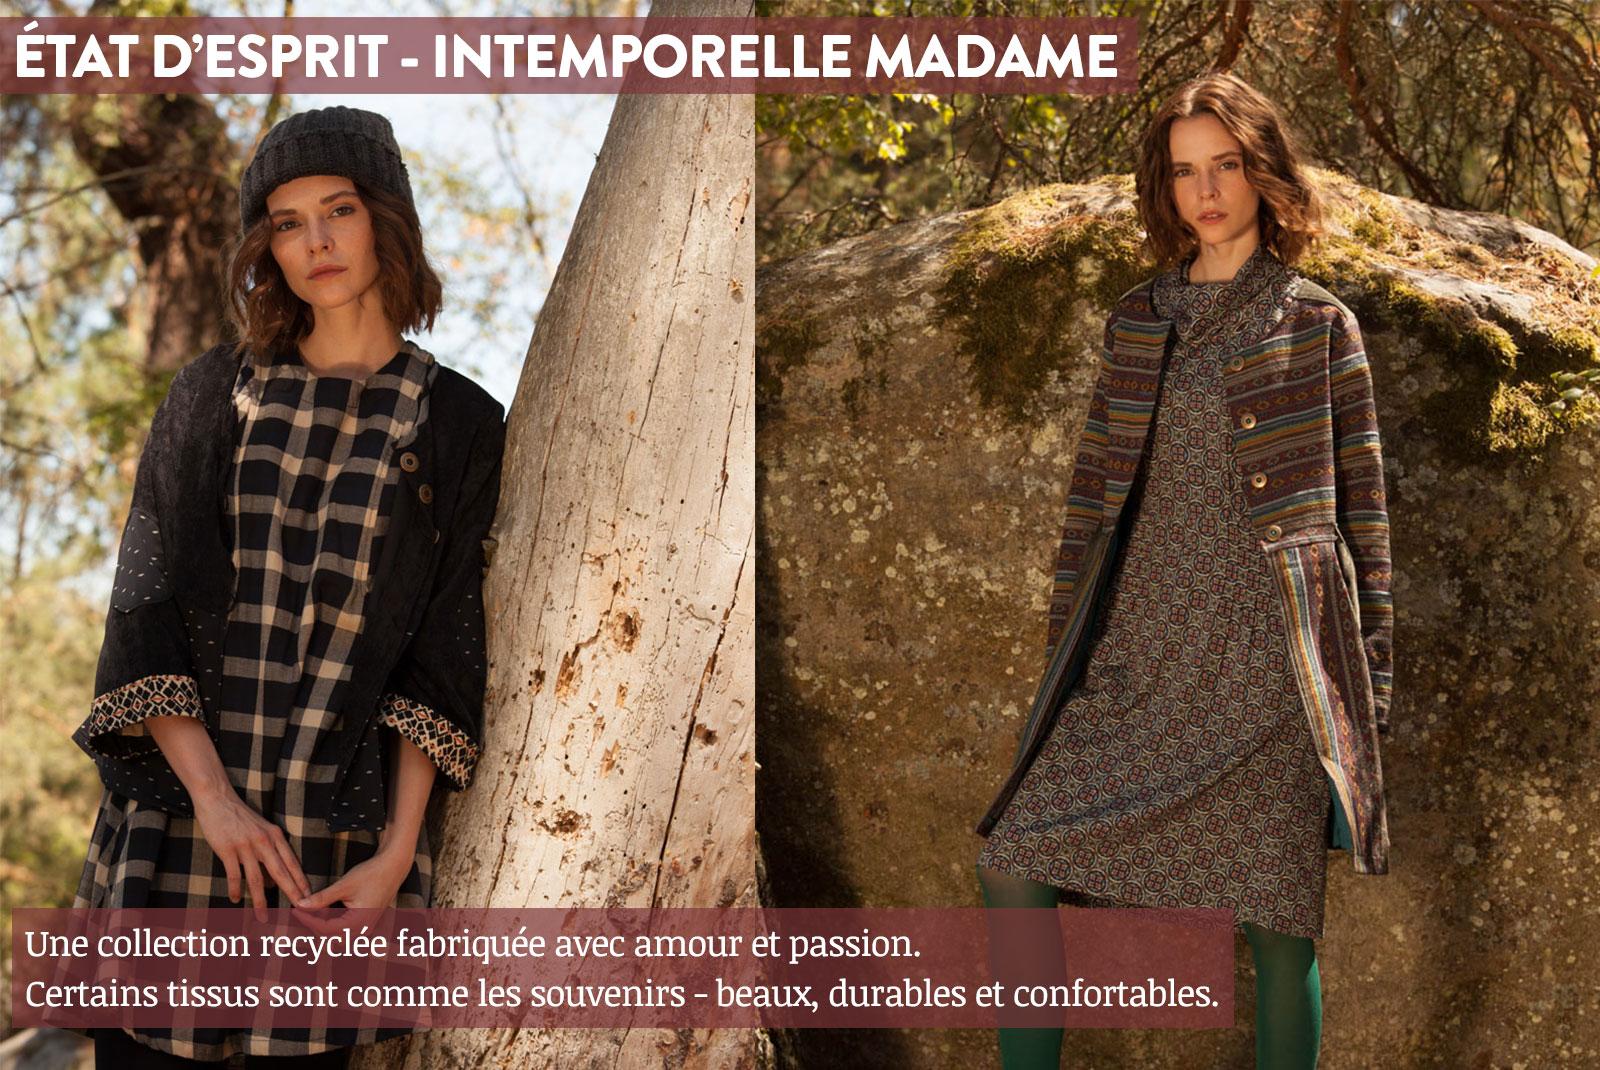 Nid d'Abeille Etat d'Esprit - Intemporelle Madame Lookbook